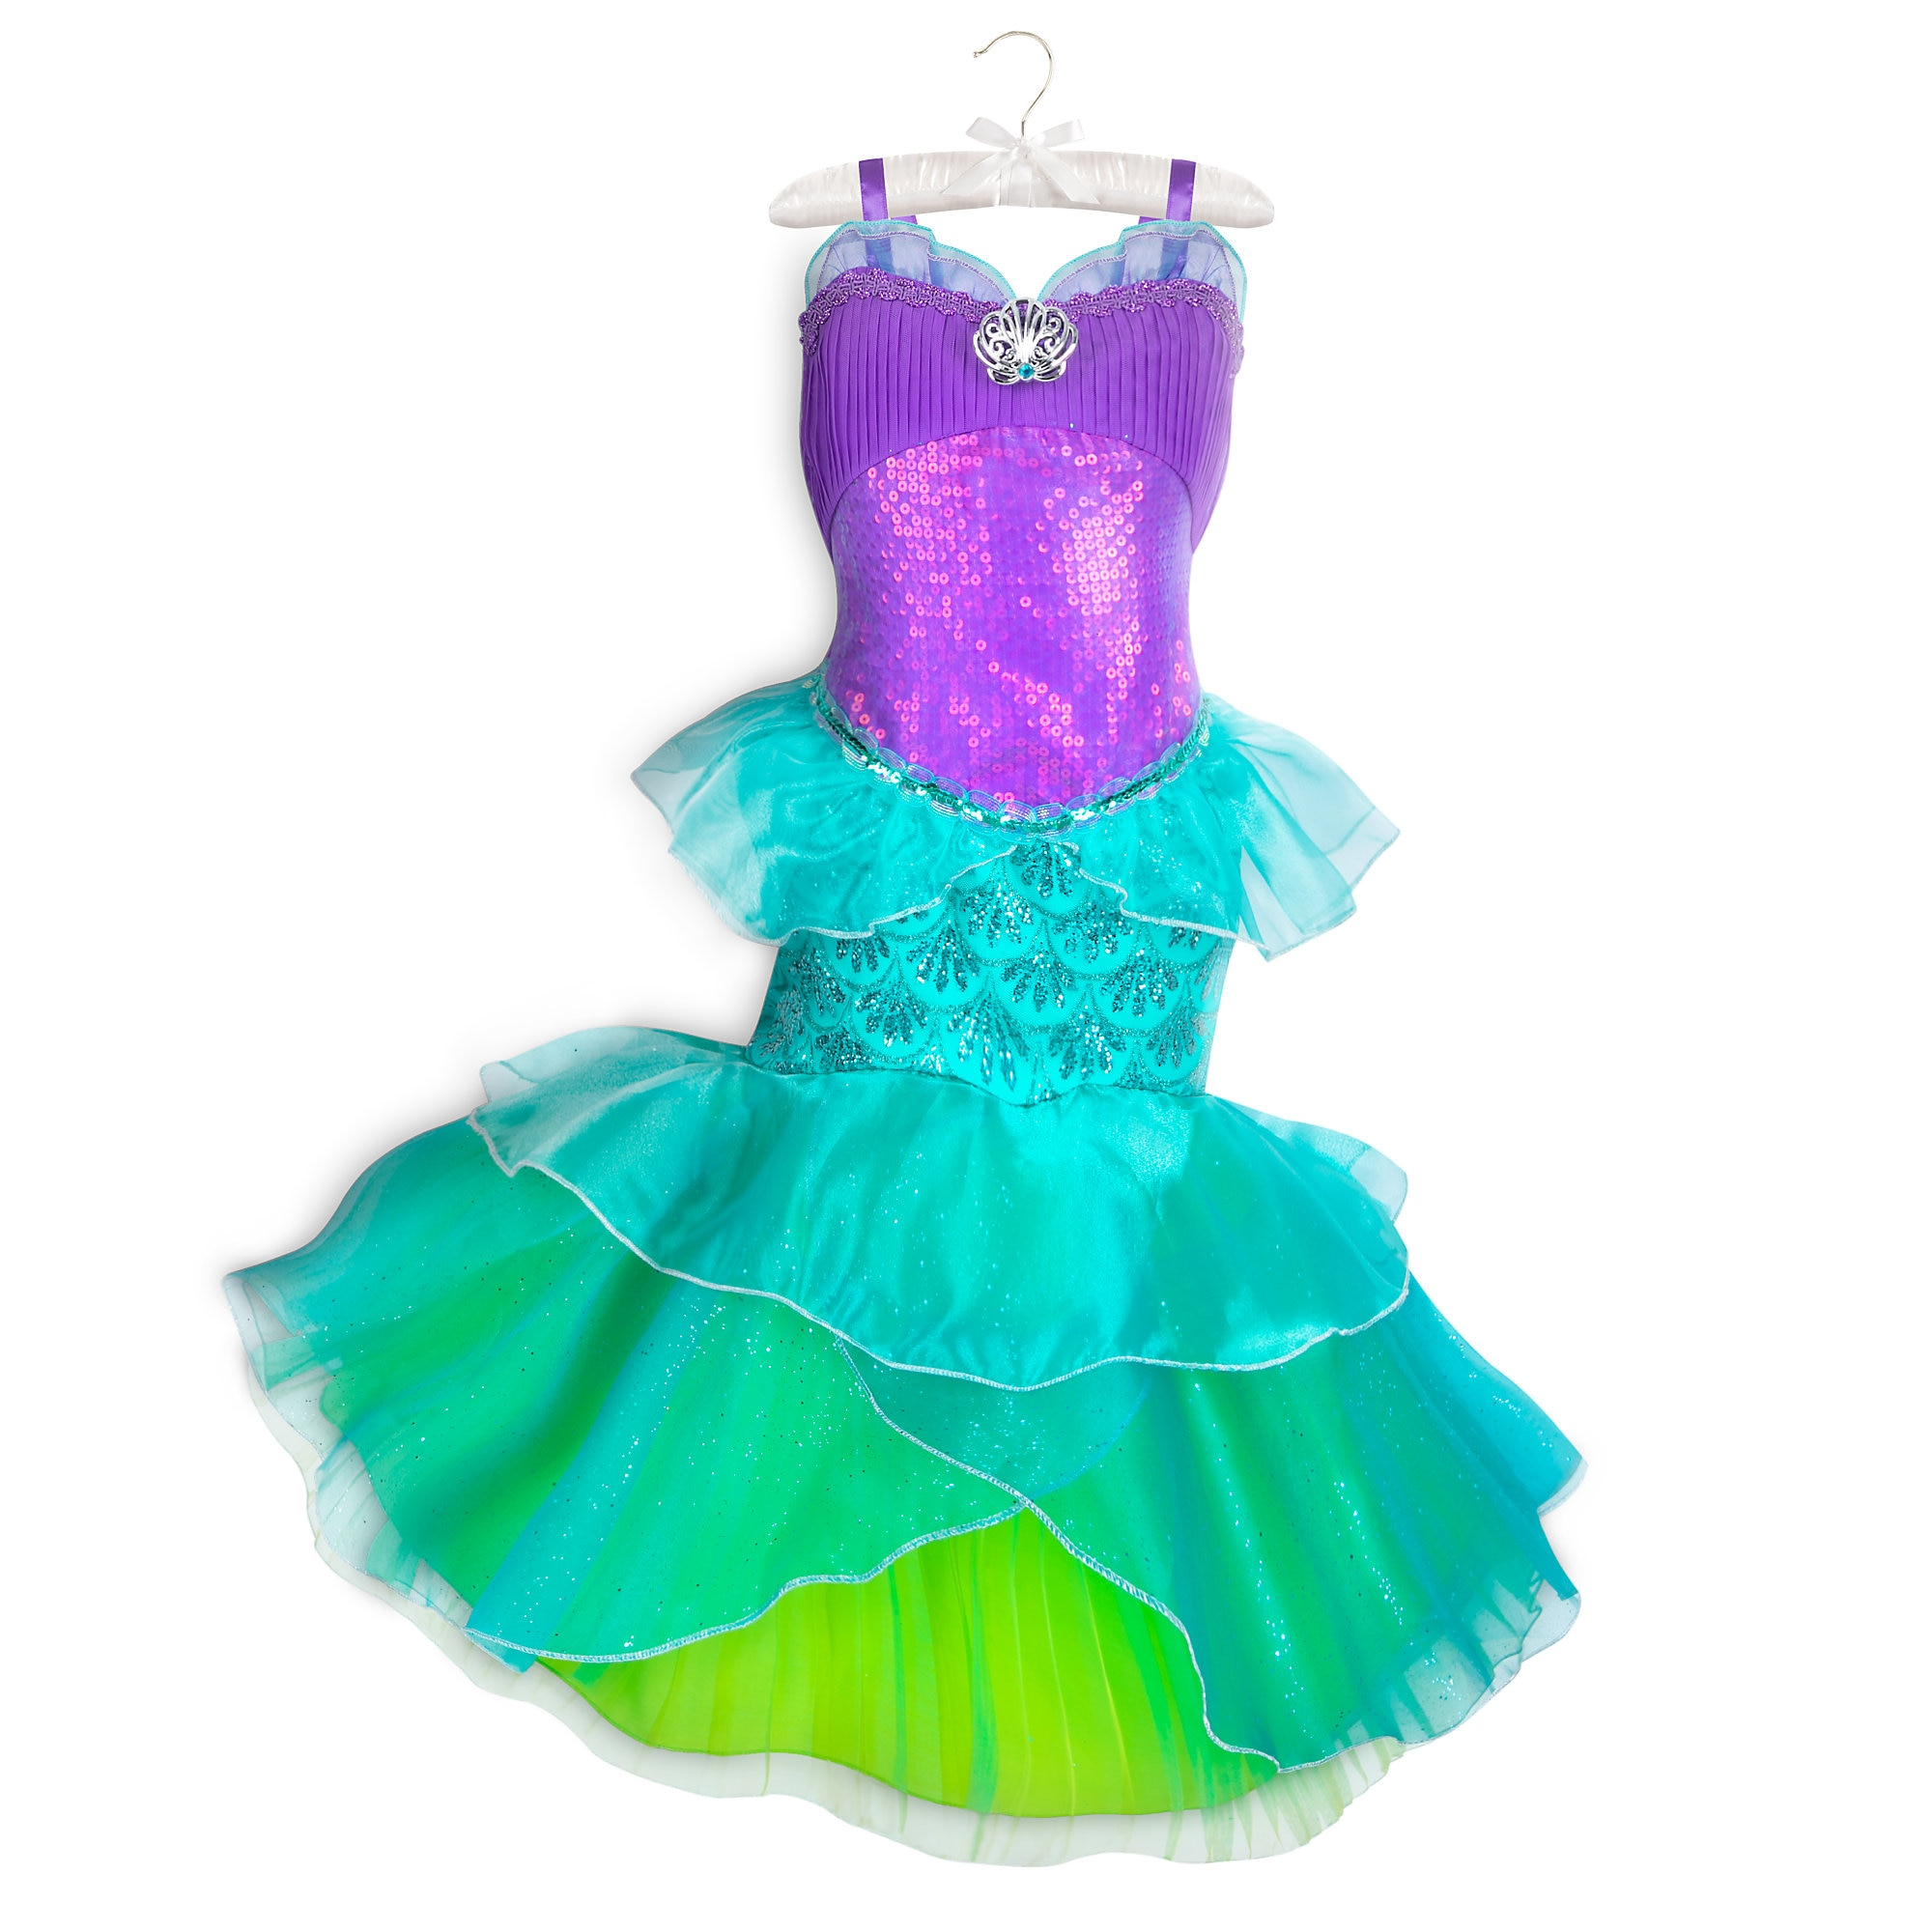 Thumbnail Image of Ariel Costume for Kids - The Little Mermaid # 1  sc 1 st  shopDisney & Ariel Costume for Kids - The Little Mermaid | shopDisney